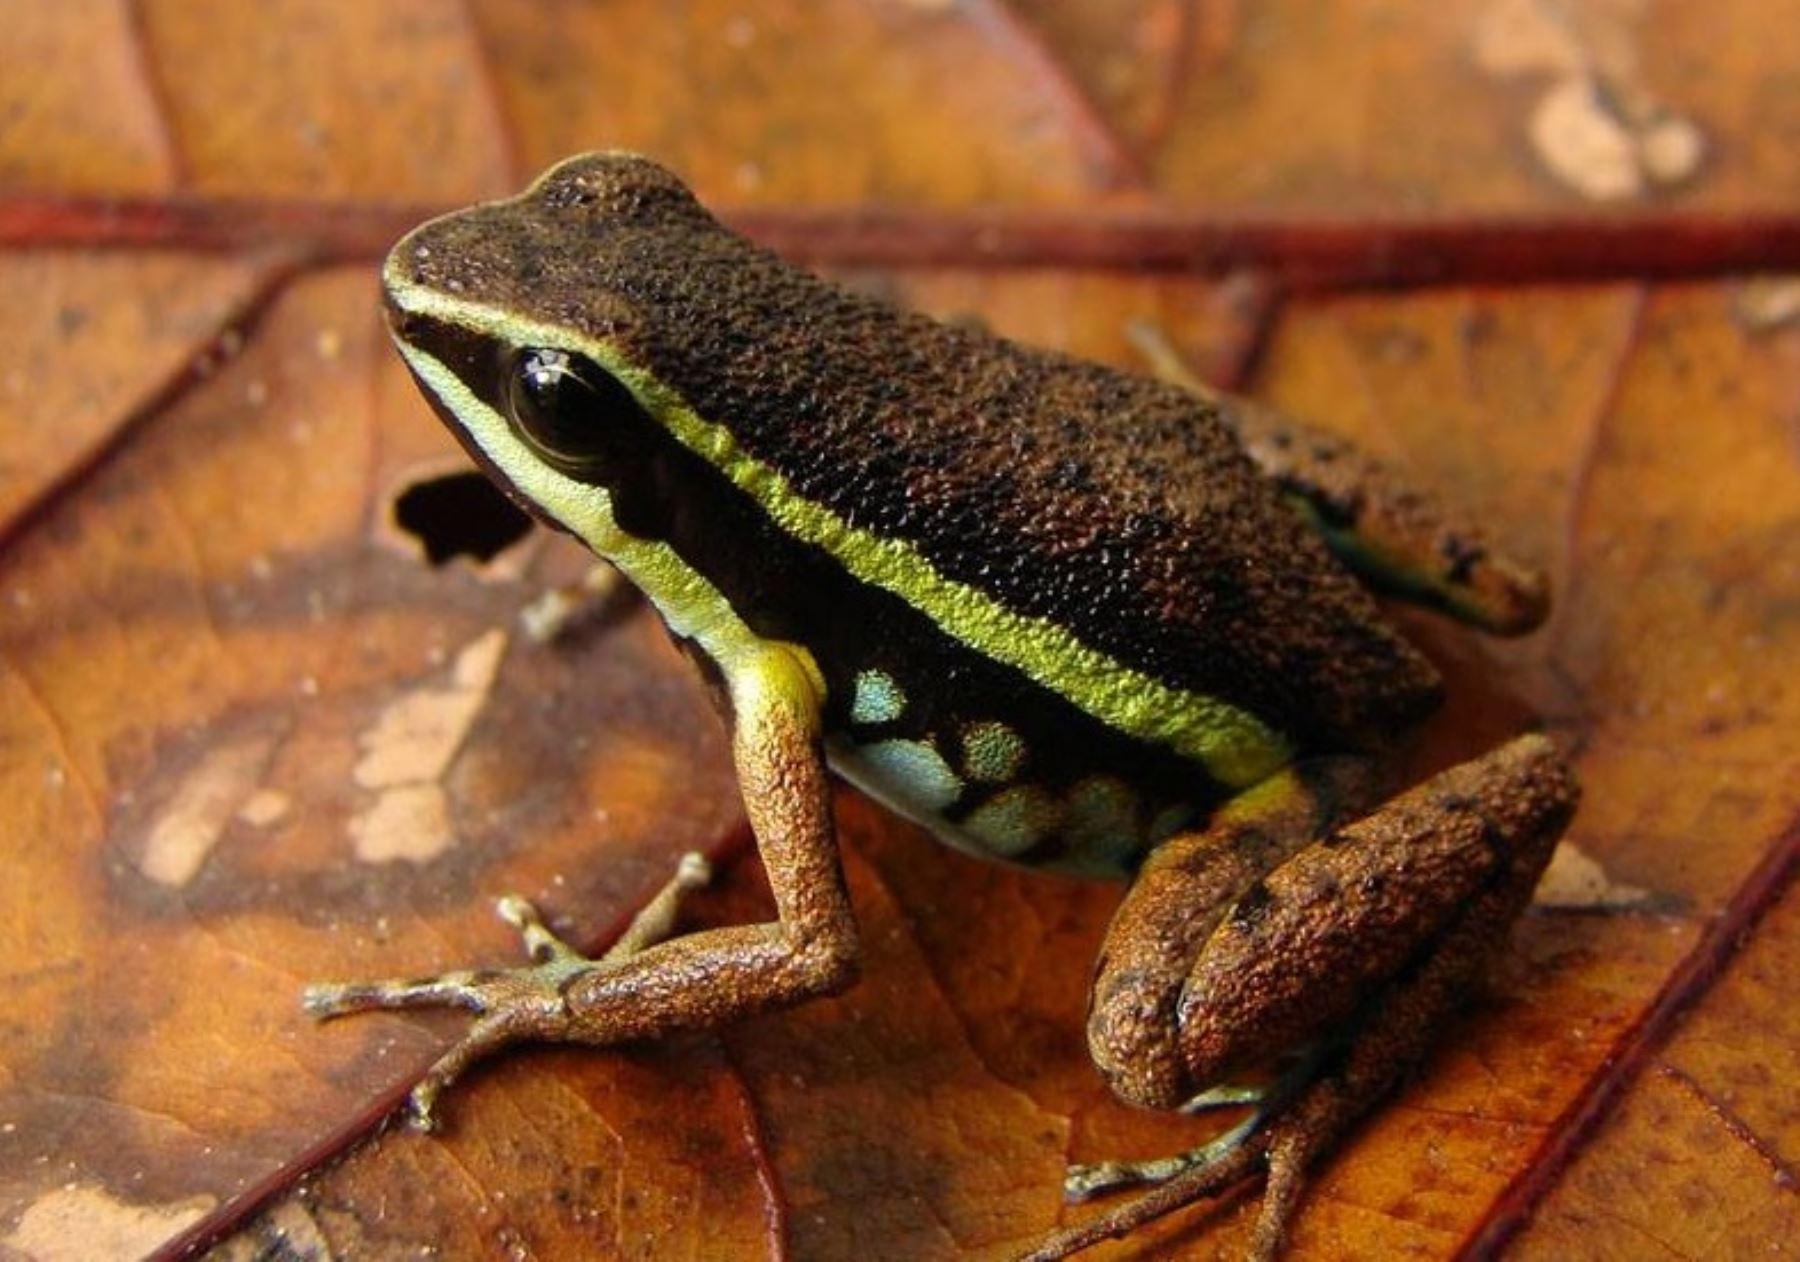 Ameerega ignipedis, rana venenosa encontrada en el Parque Nacional Sierra del Divisor. Foto: Facebook Parque Nacional Sierra del Divisor/Evan Twomey.